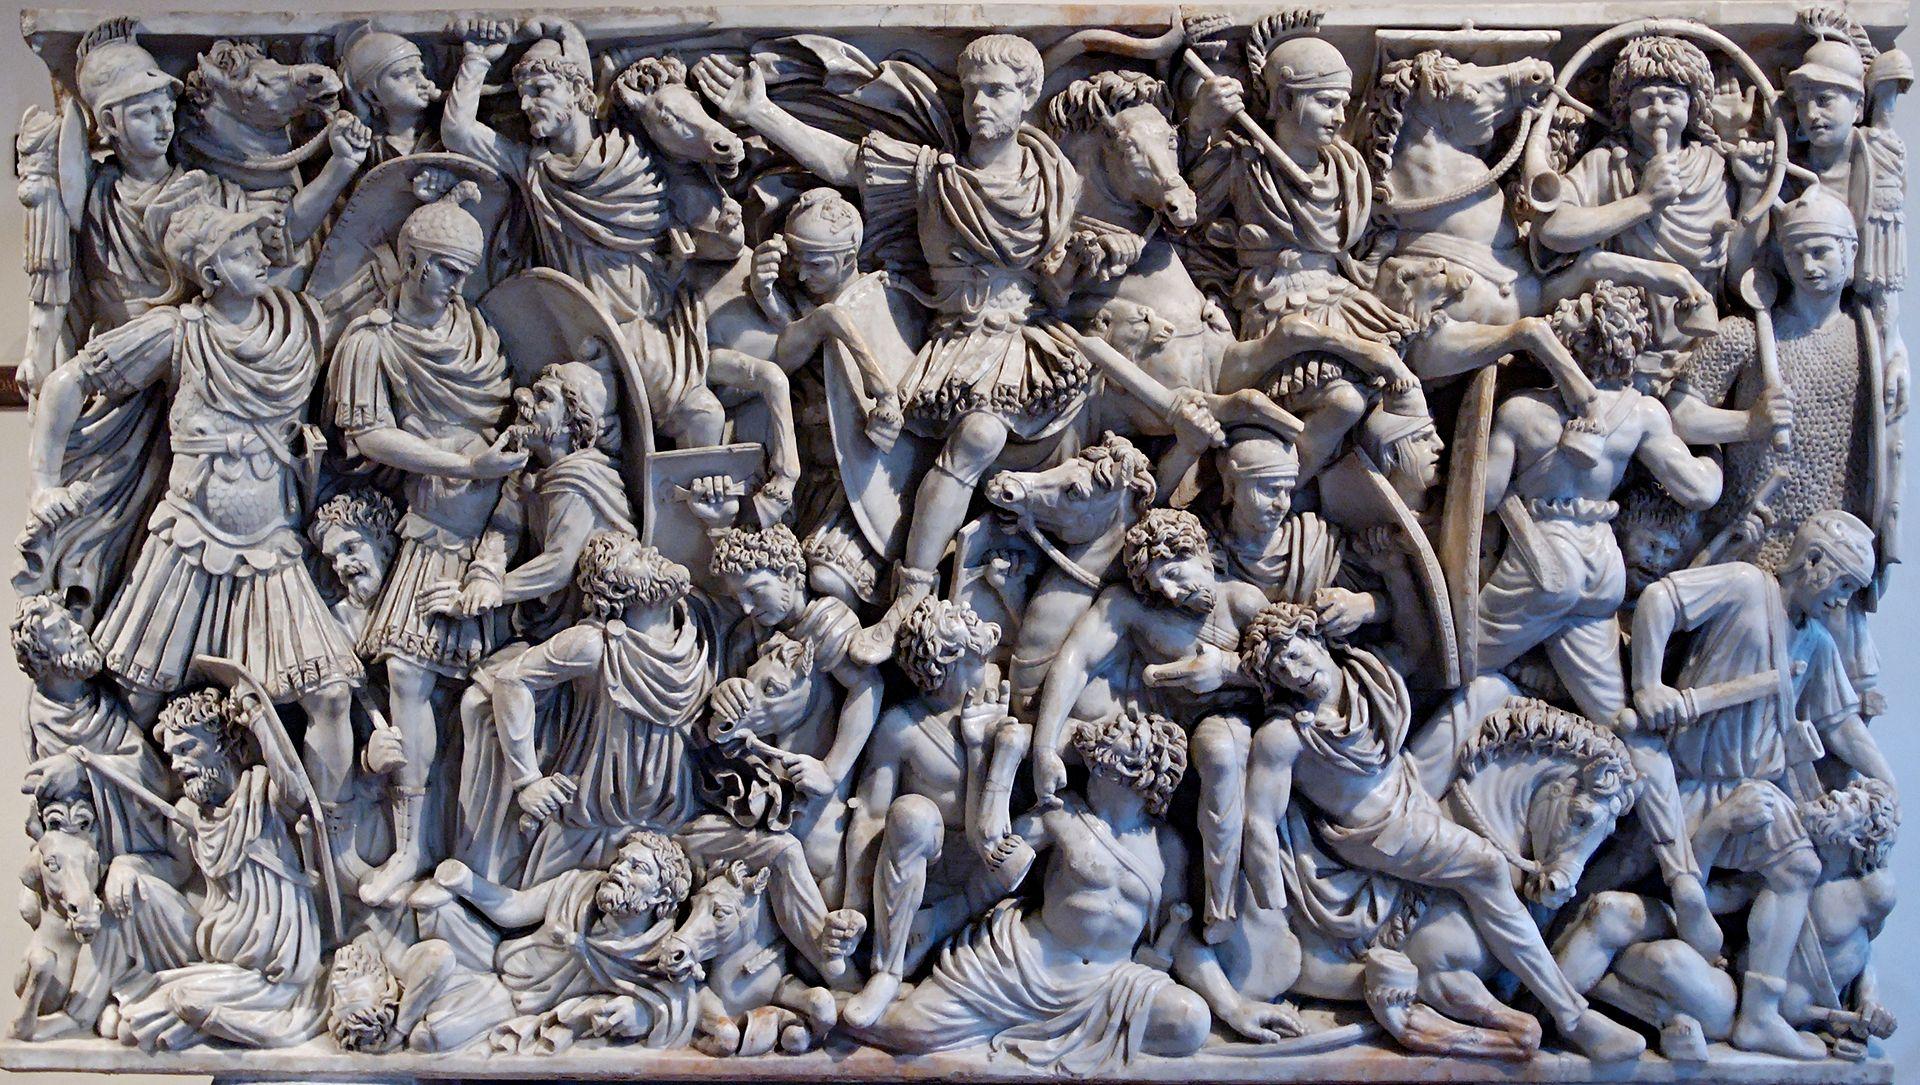 https://i1.wp.com/amazingbibletimeline.com/wp-content/uploads/2015/02/Battle_of_Adrianople_Goths_vs_Romans.jpg-.jpg